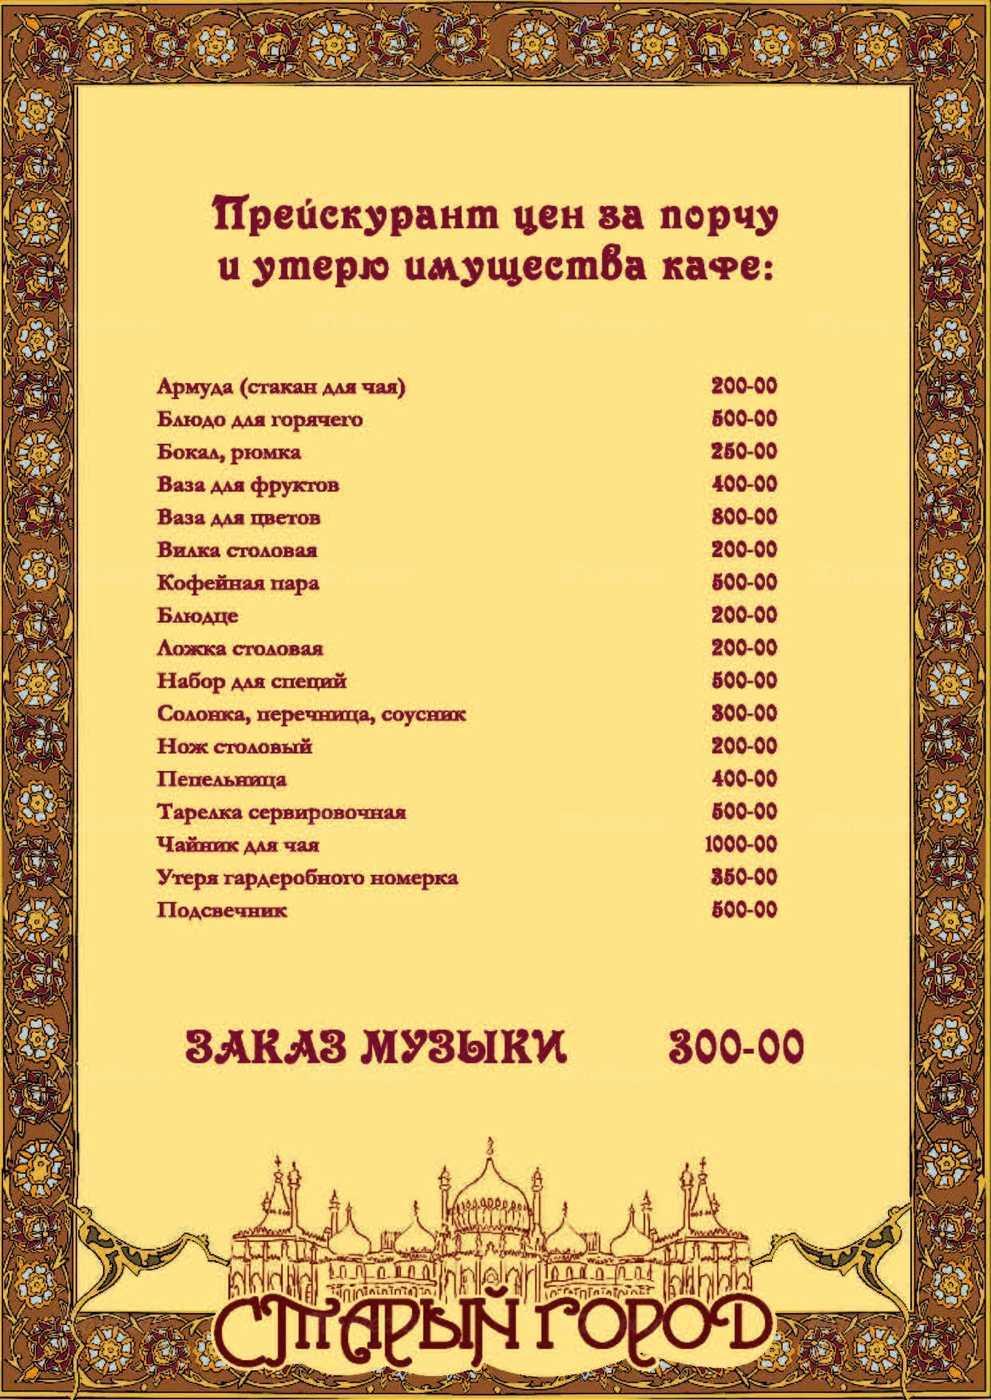 Меню кафе, ресторана Старый город на Загребском бульваре